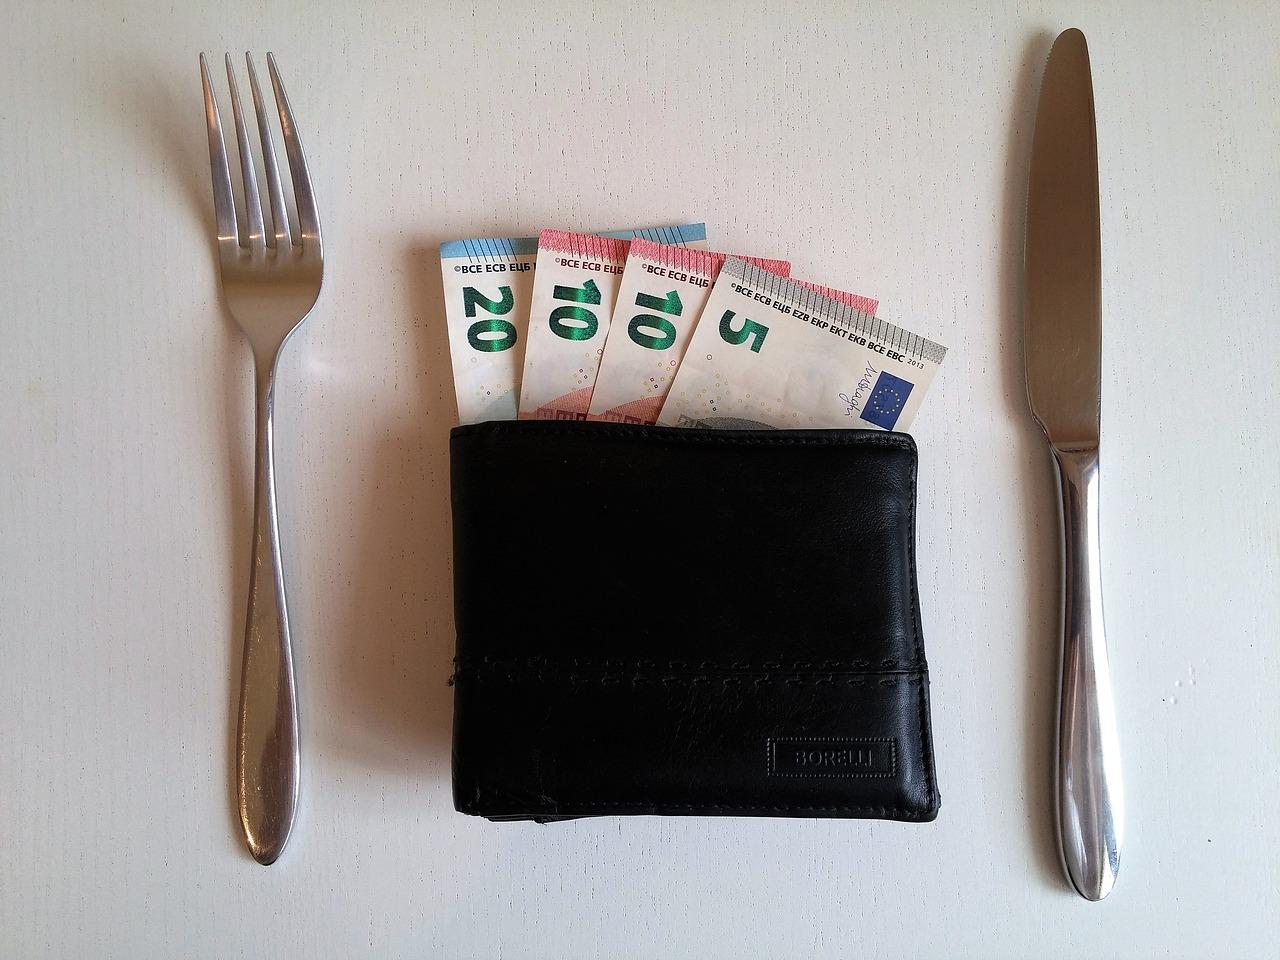 spara pengar tips